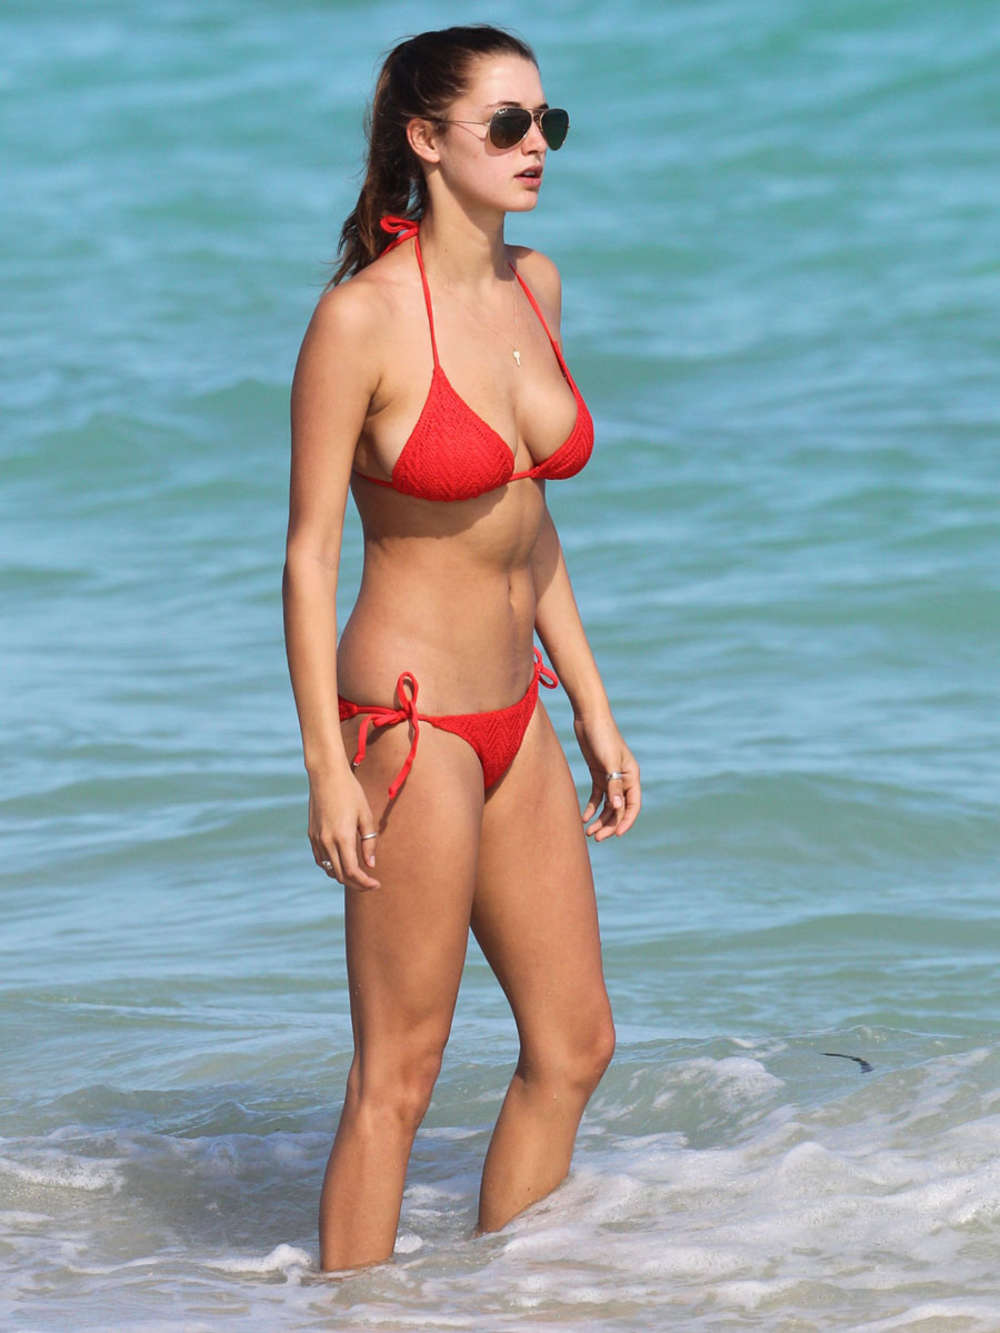 Hot Alyssa Arca nudes (59 photos), Ass, Bikini, Instagram, panties 2017